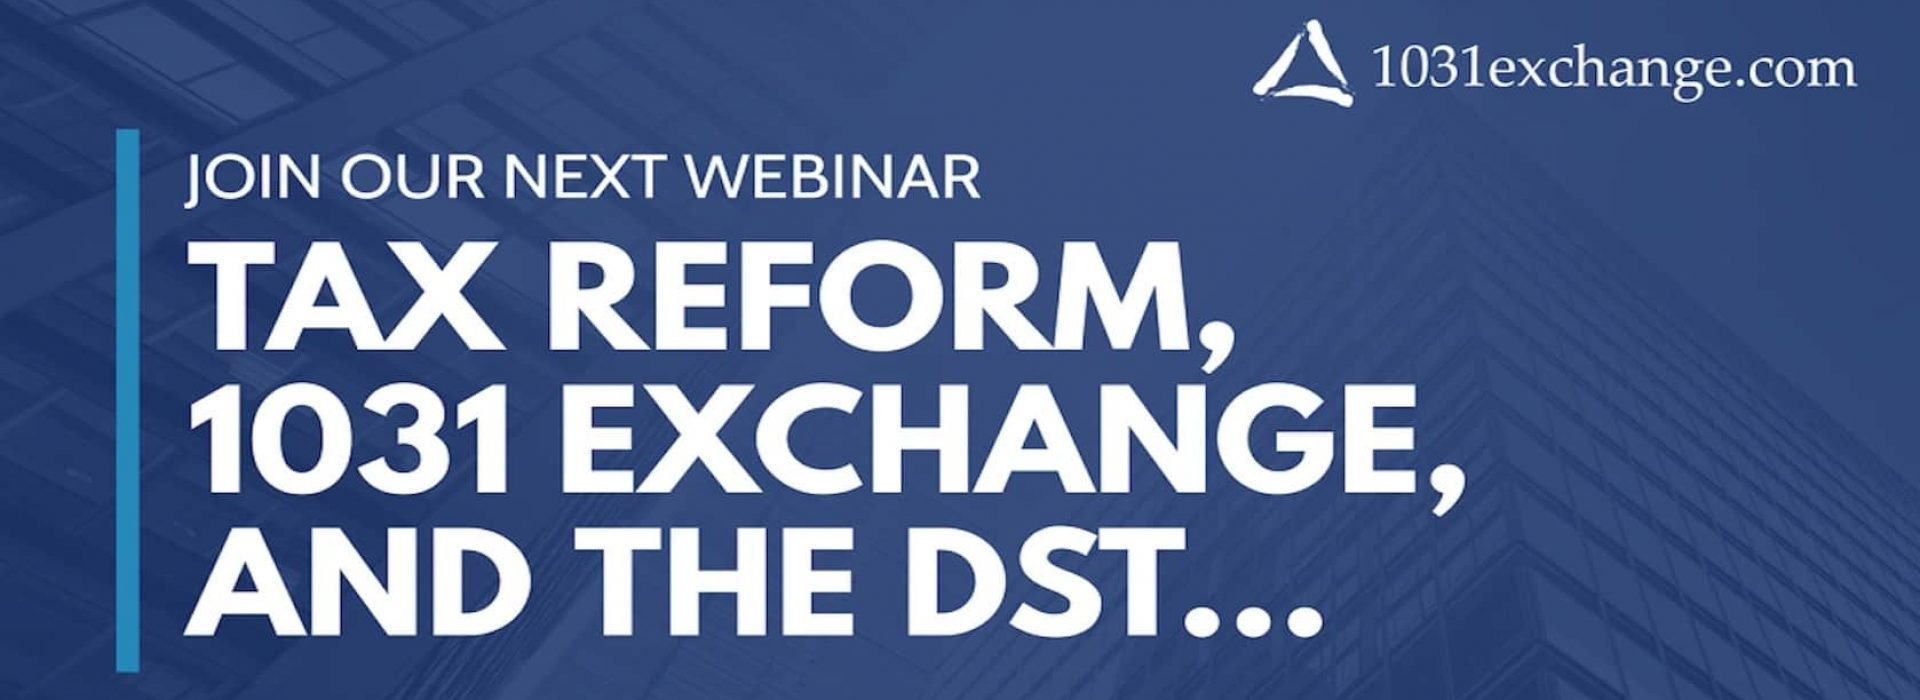 Tax Reform Webinar 2